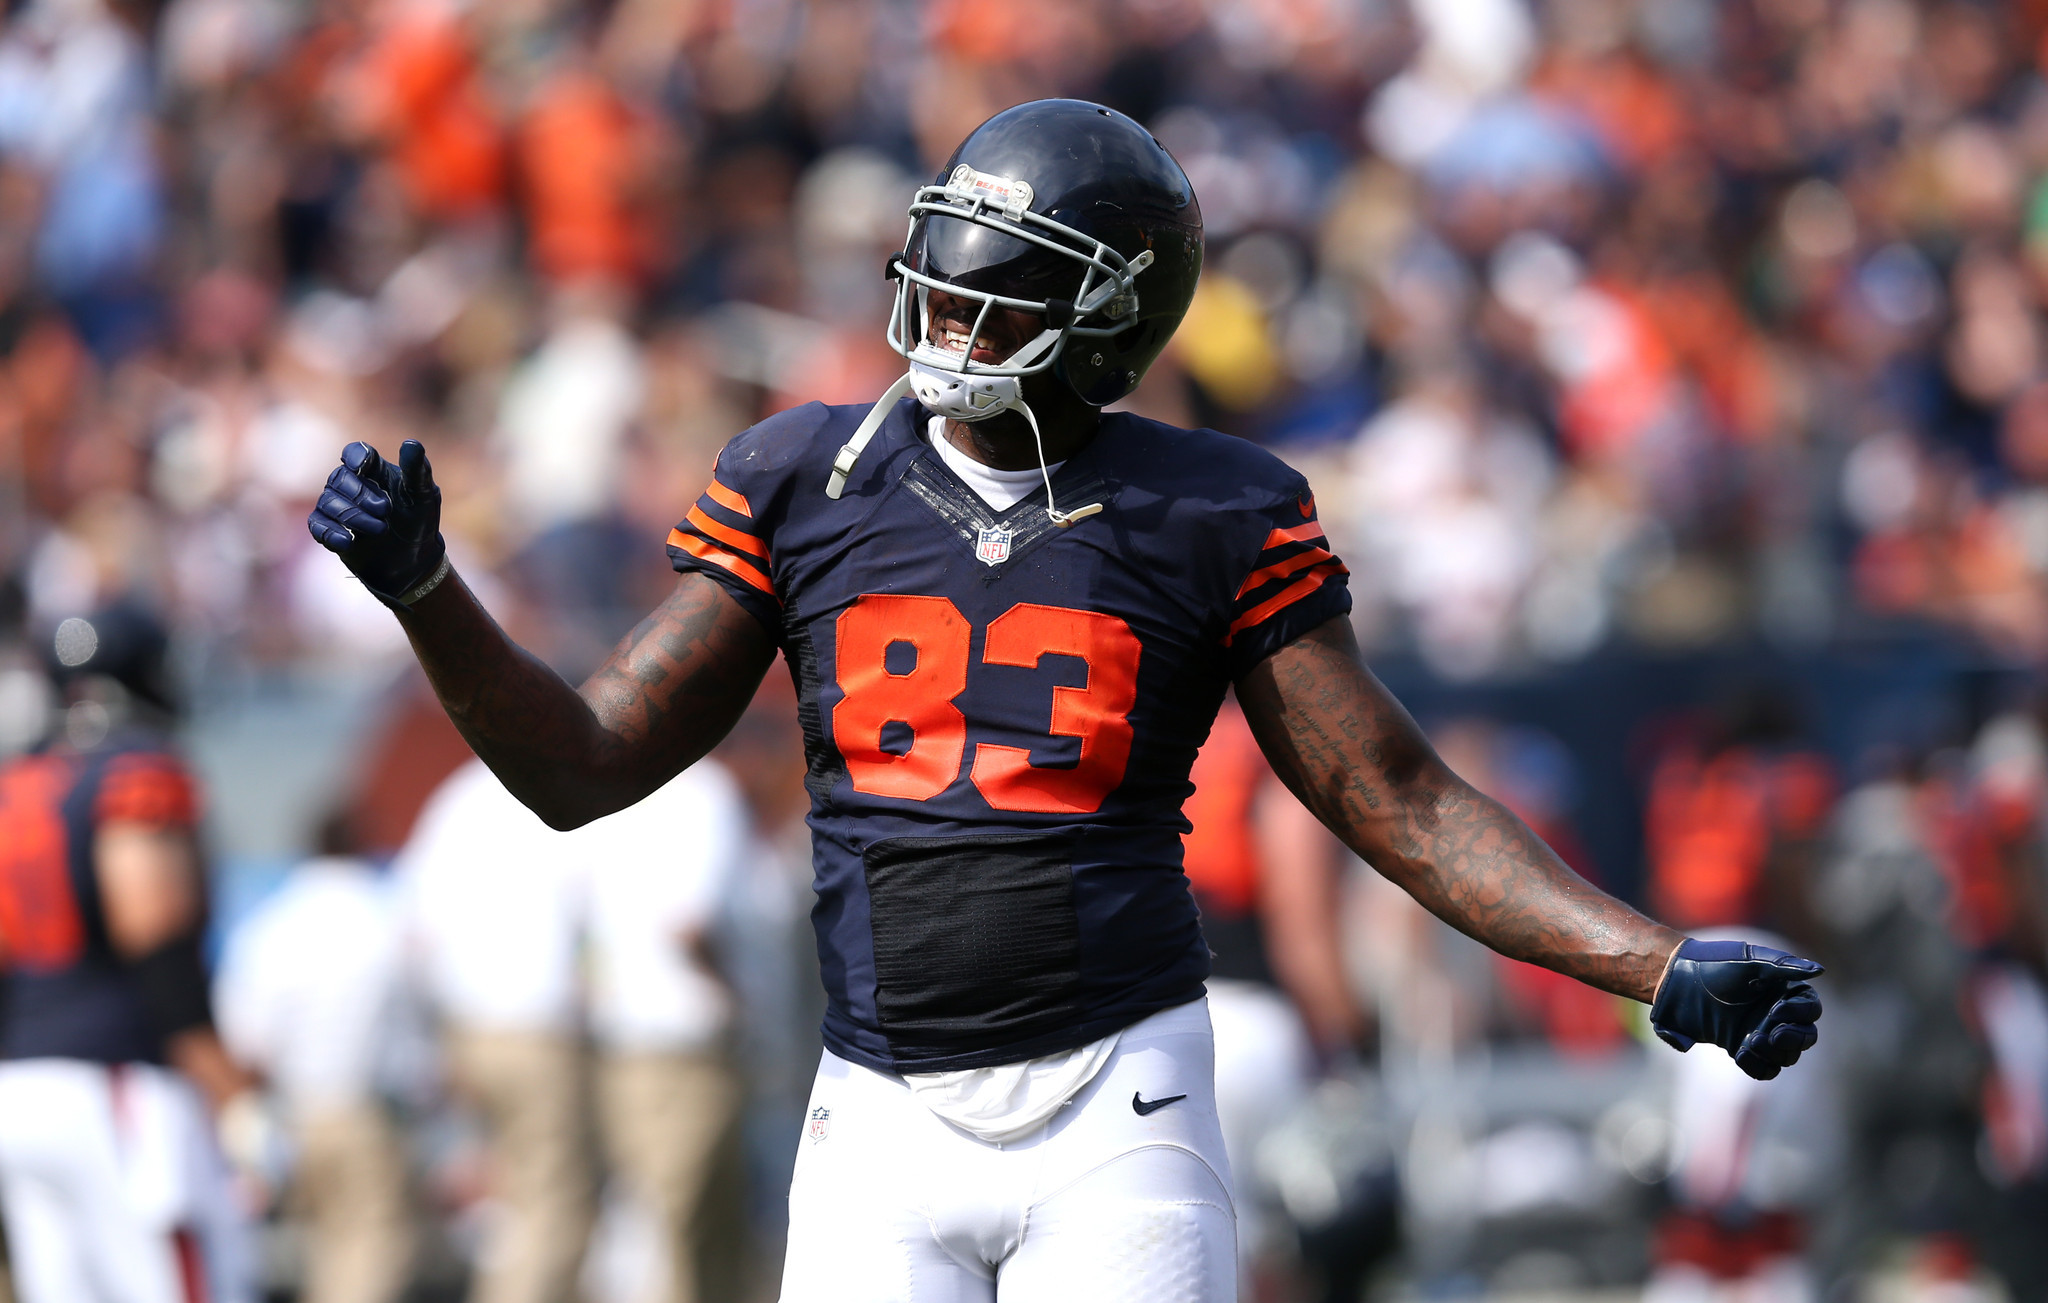 Martellus Bennett puts colorful spin on Bears loss Chicago Tribune